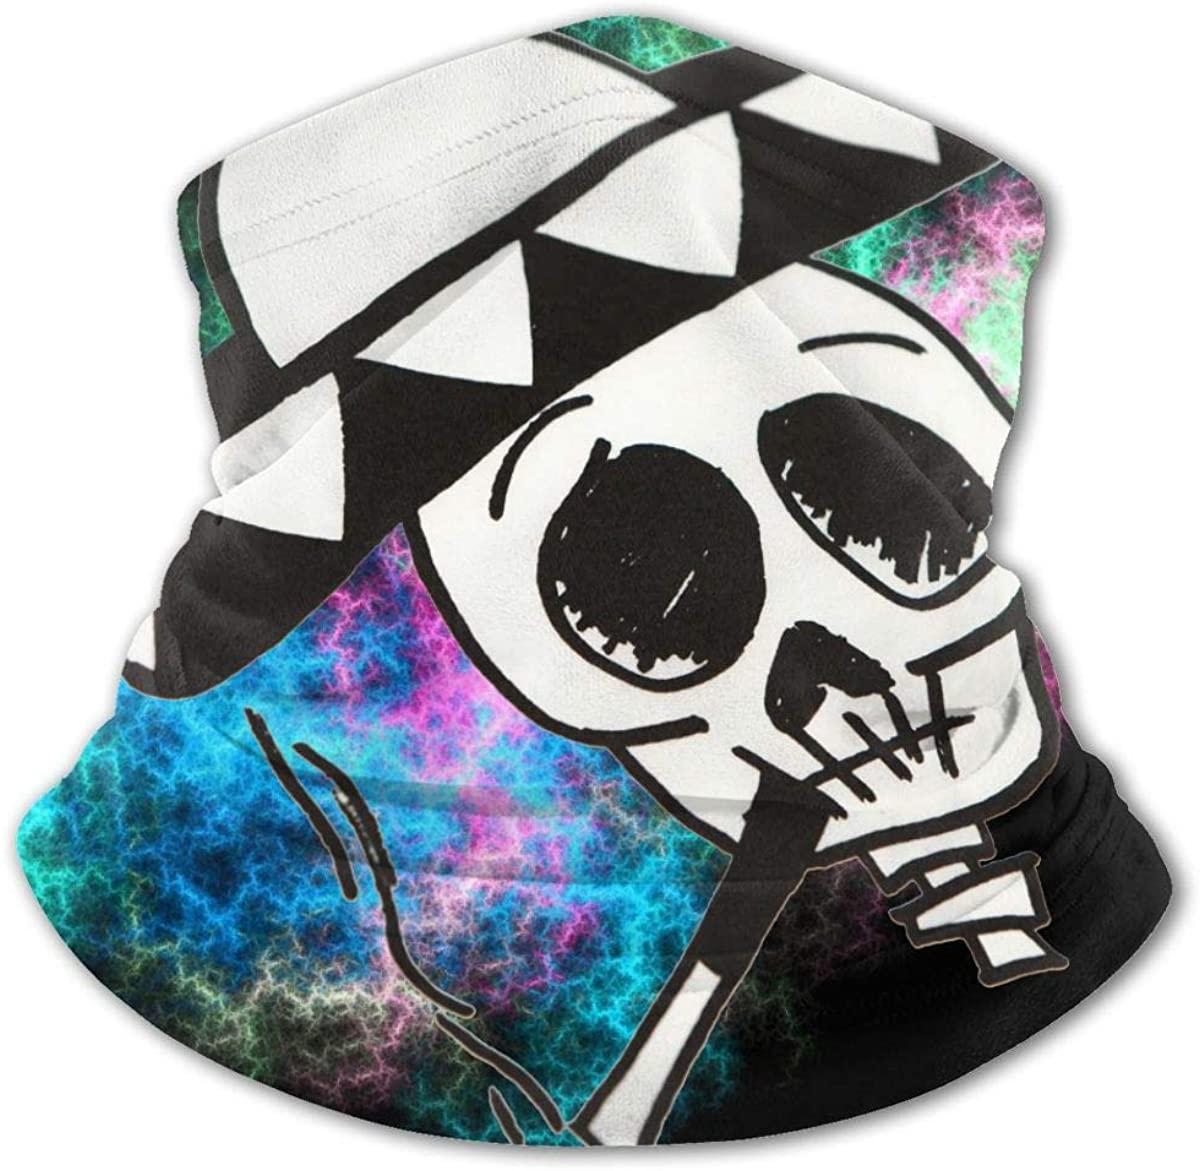 Tash Sultana Face Mask Bandanas,Neck Gaiter,Headwear,Magic Scarf,Headband for Dust Sun Wind,Reusable Bandana Face Cover Black